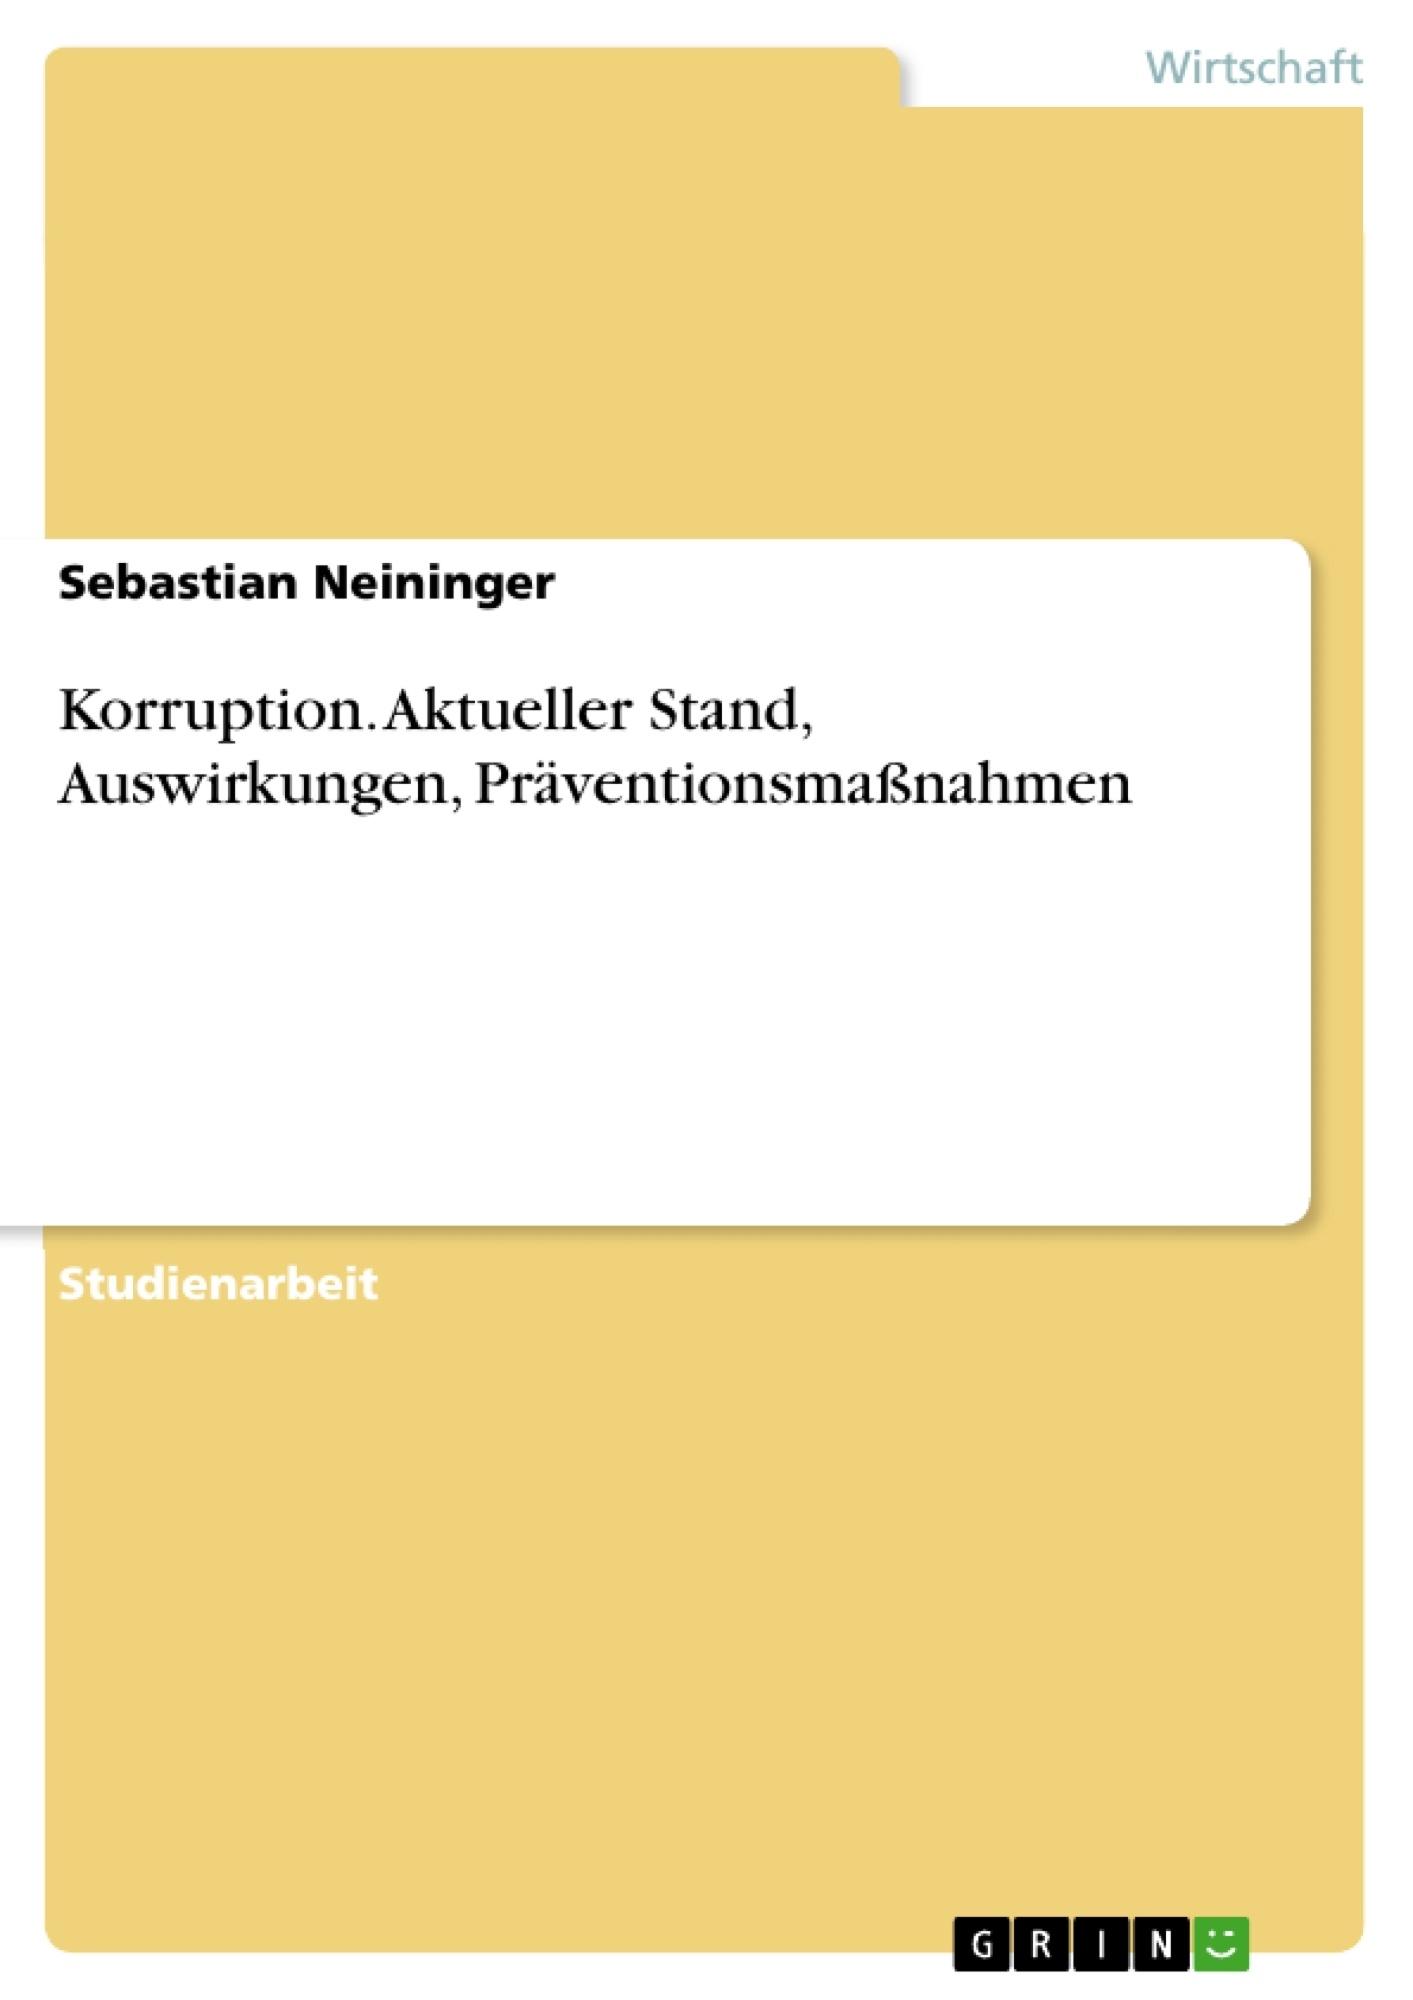 Titel: Korruption. Aktueller Stand, Auswirkungen, Präventionsmaßnahmen